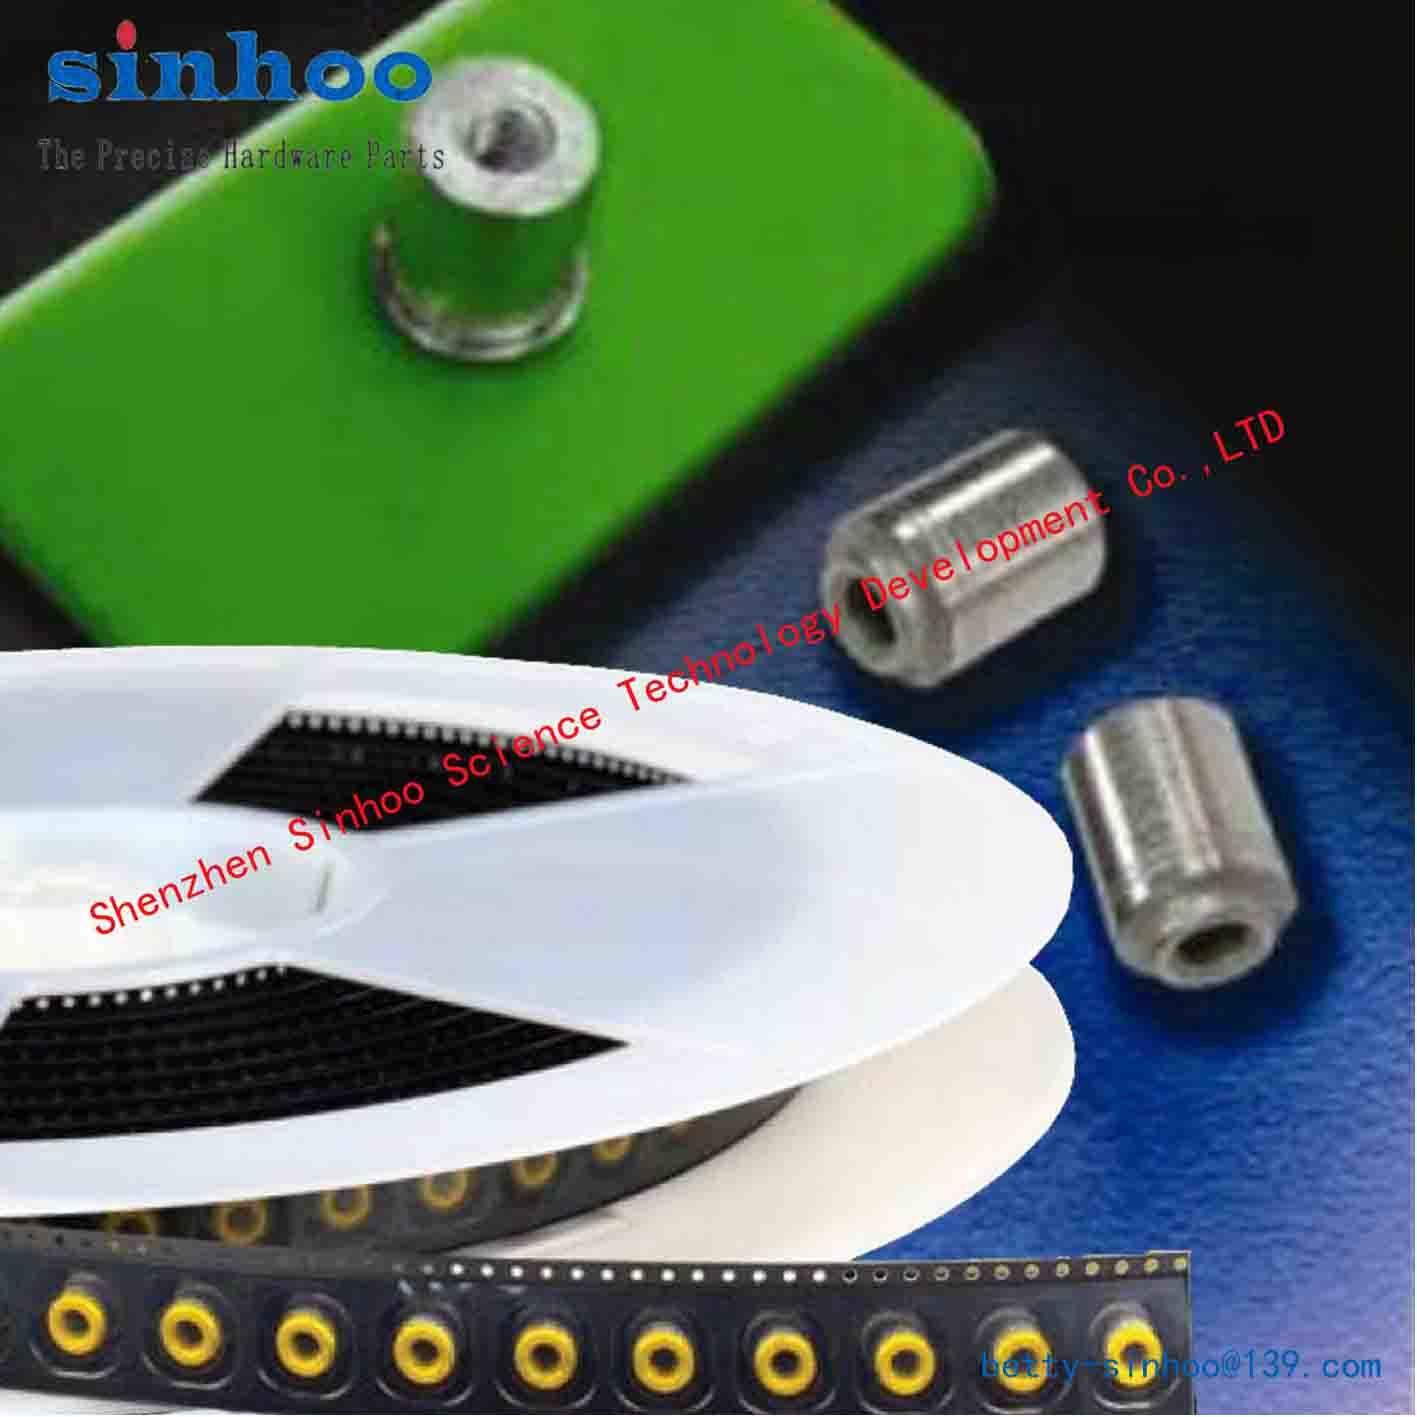 SMD Nut, Weld Nut, Smtso-M2-3et/Reelfast/Surface Mount Fasteners/SMT Standoff/SMT Nut Steel Reel